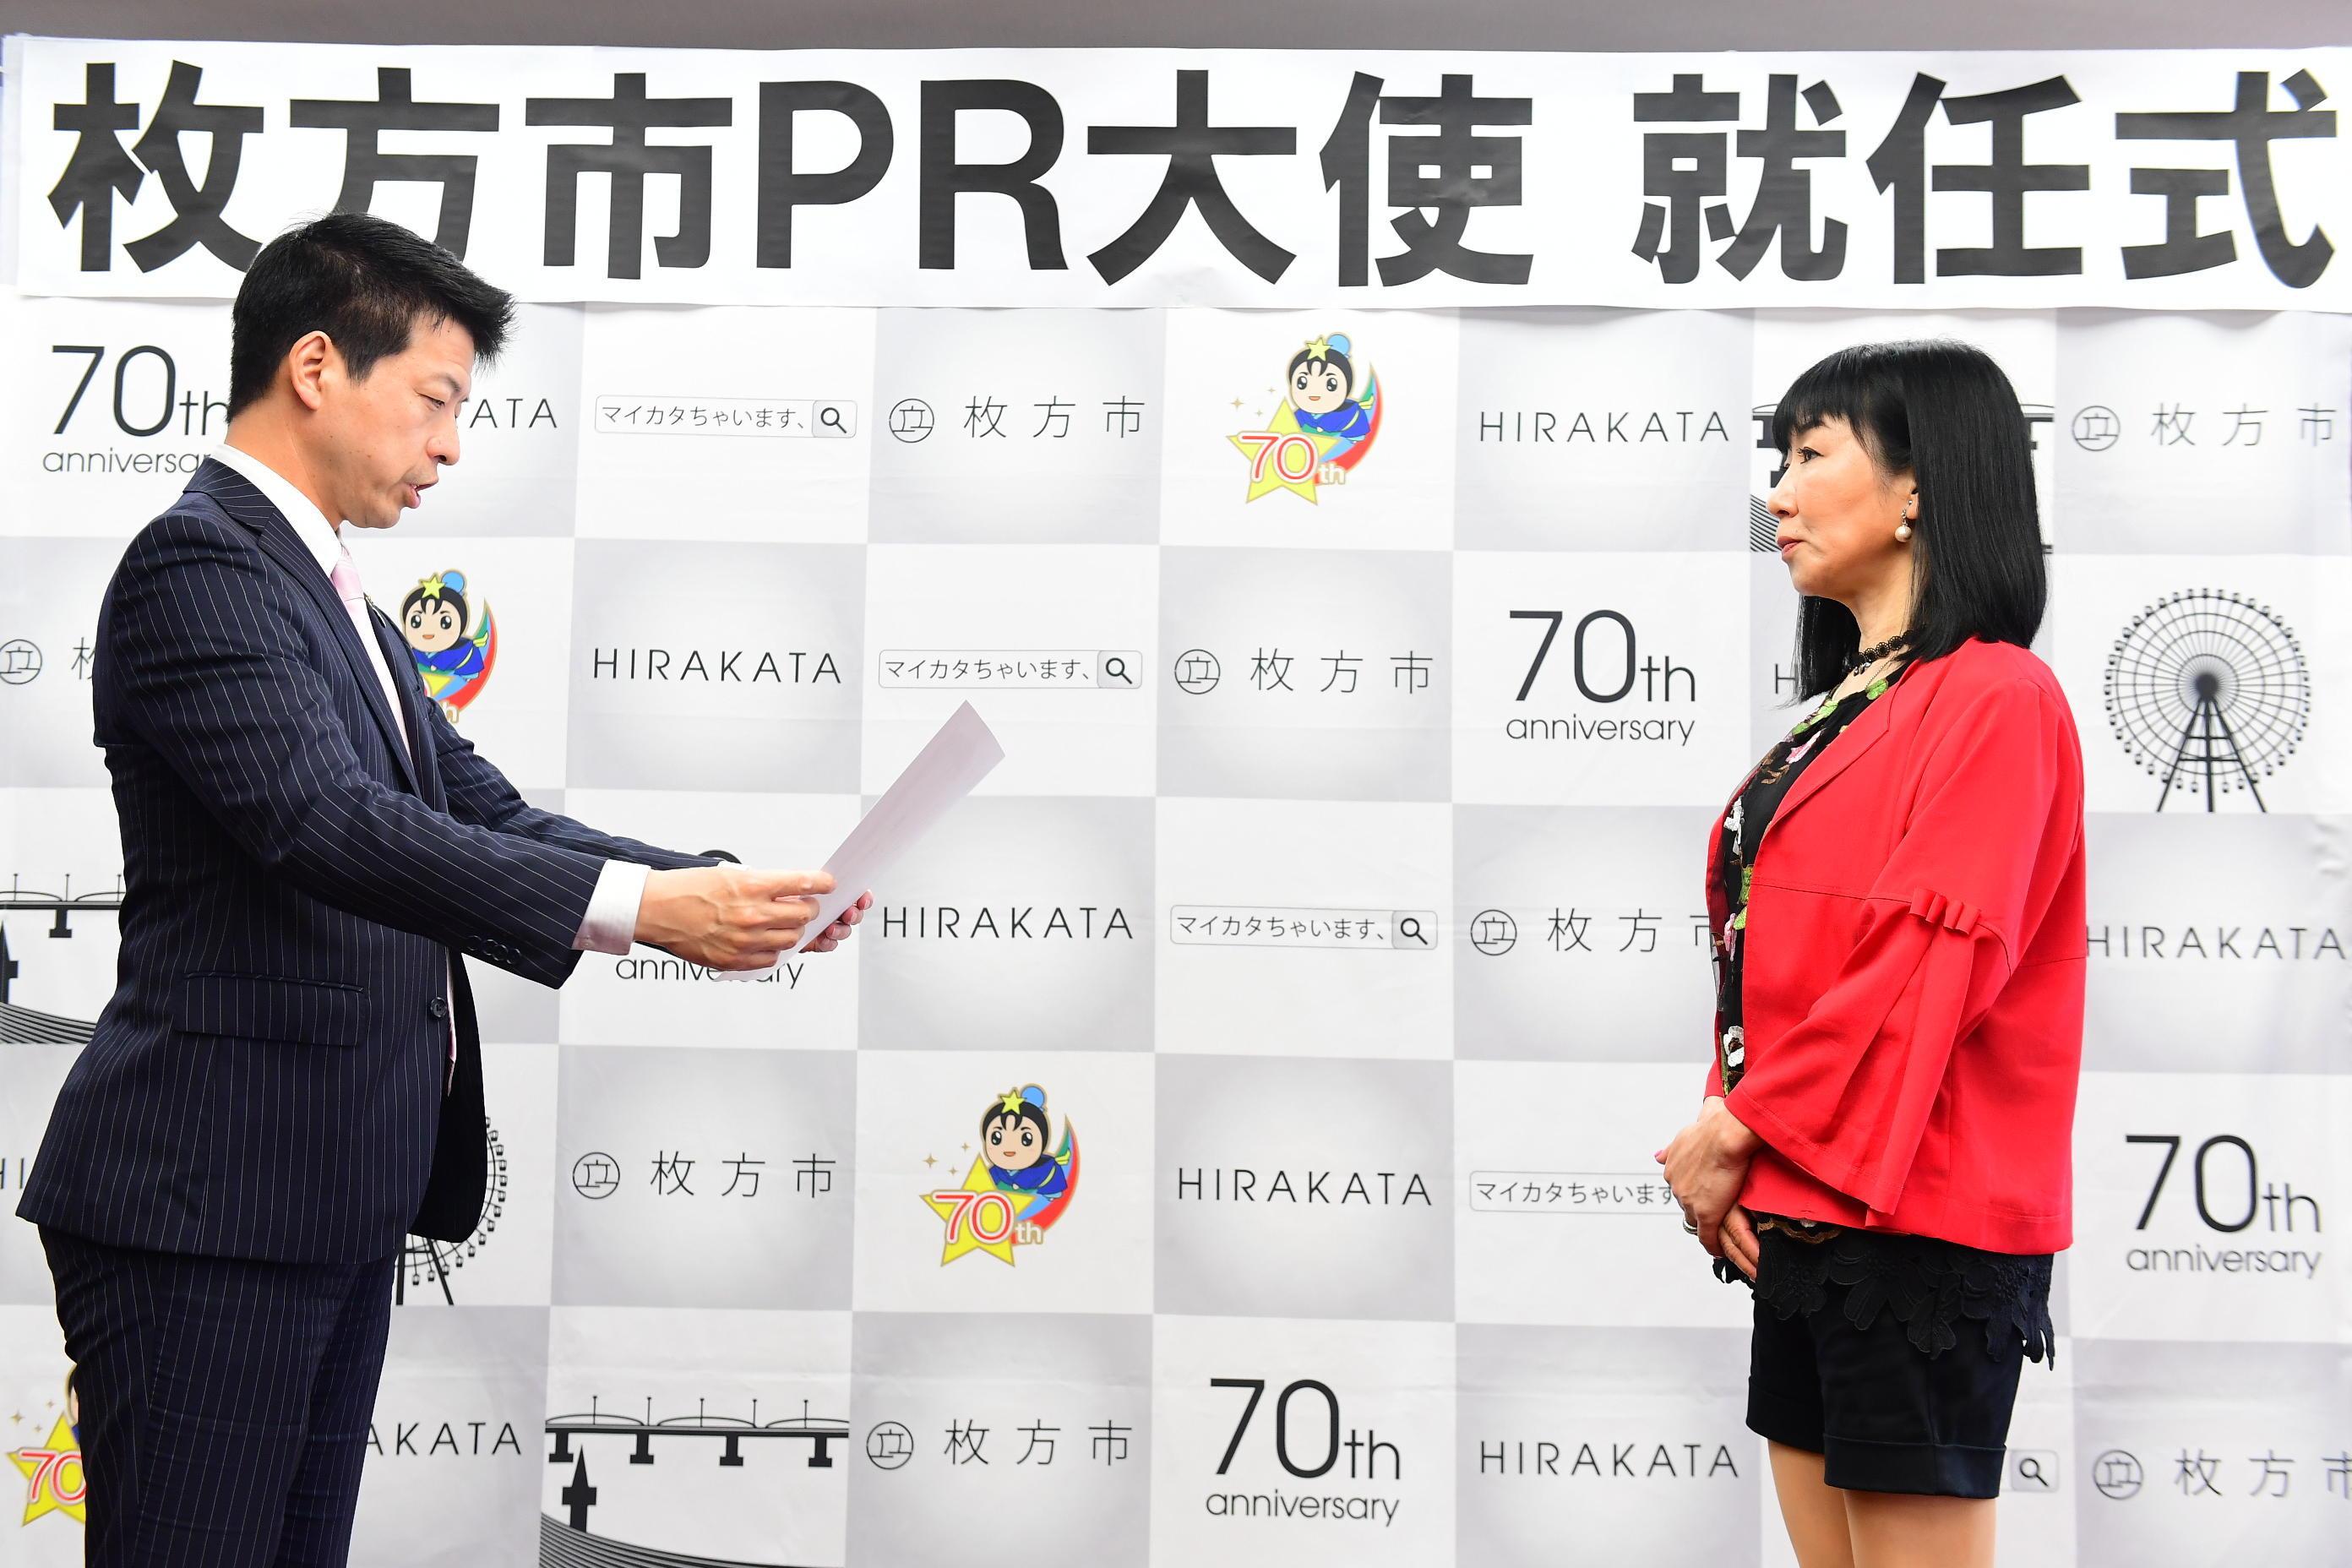 http://news.yoshimoto.co.jp/20170410172333-ec0dd3bcd3886edf66c5b029a34de905dec69b4f.jpg